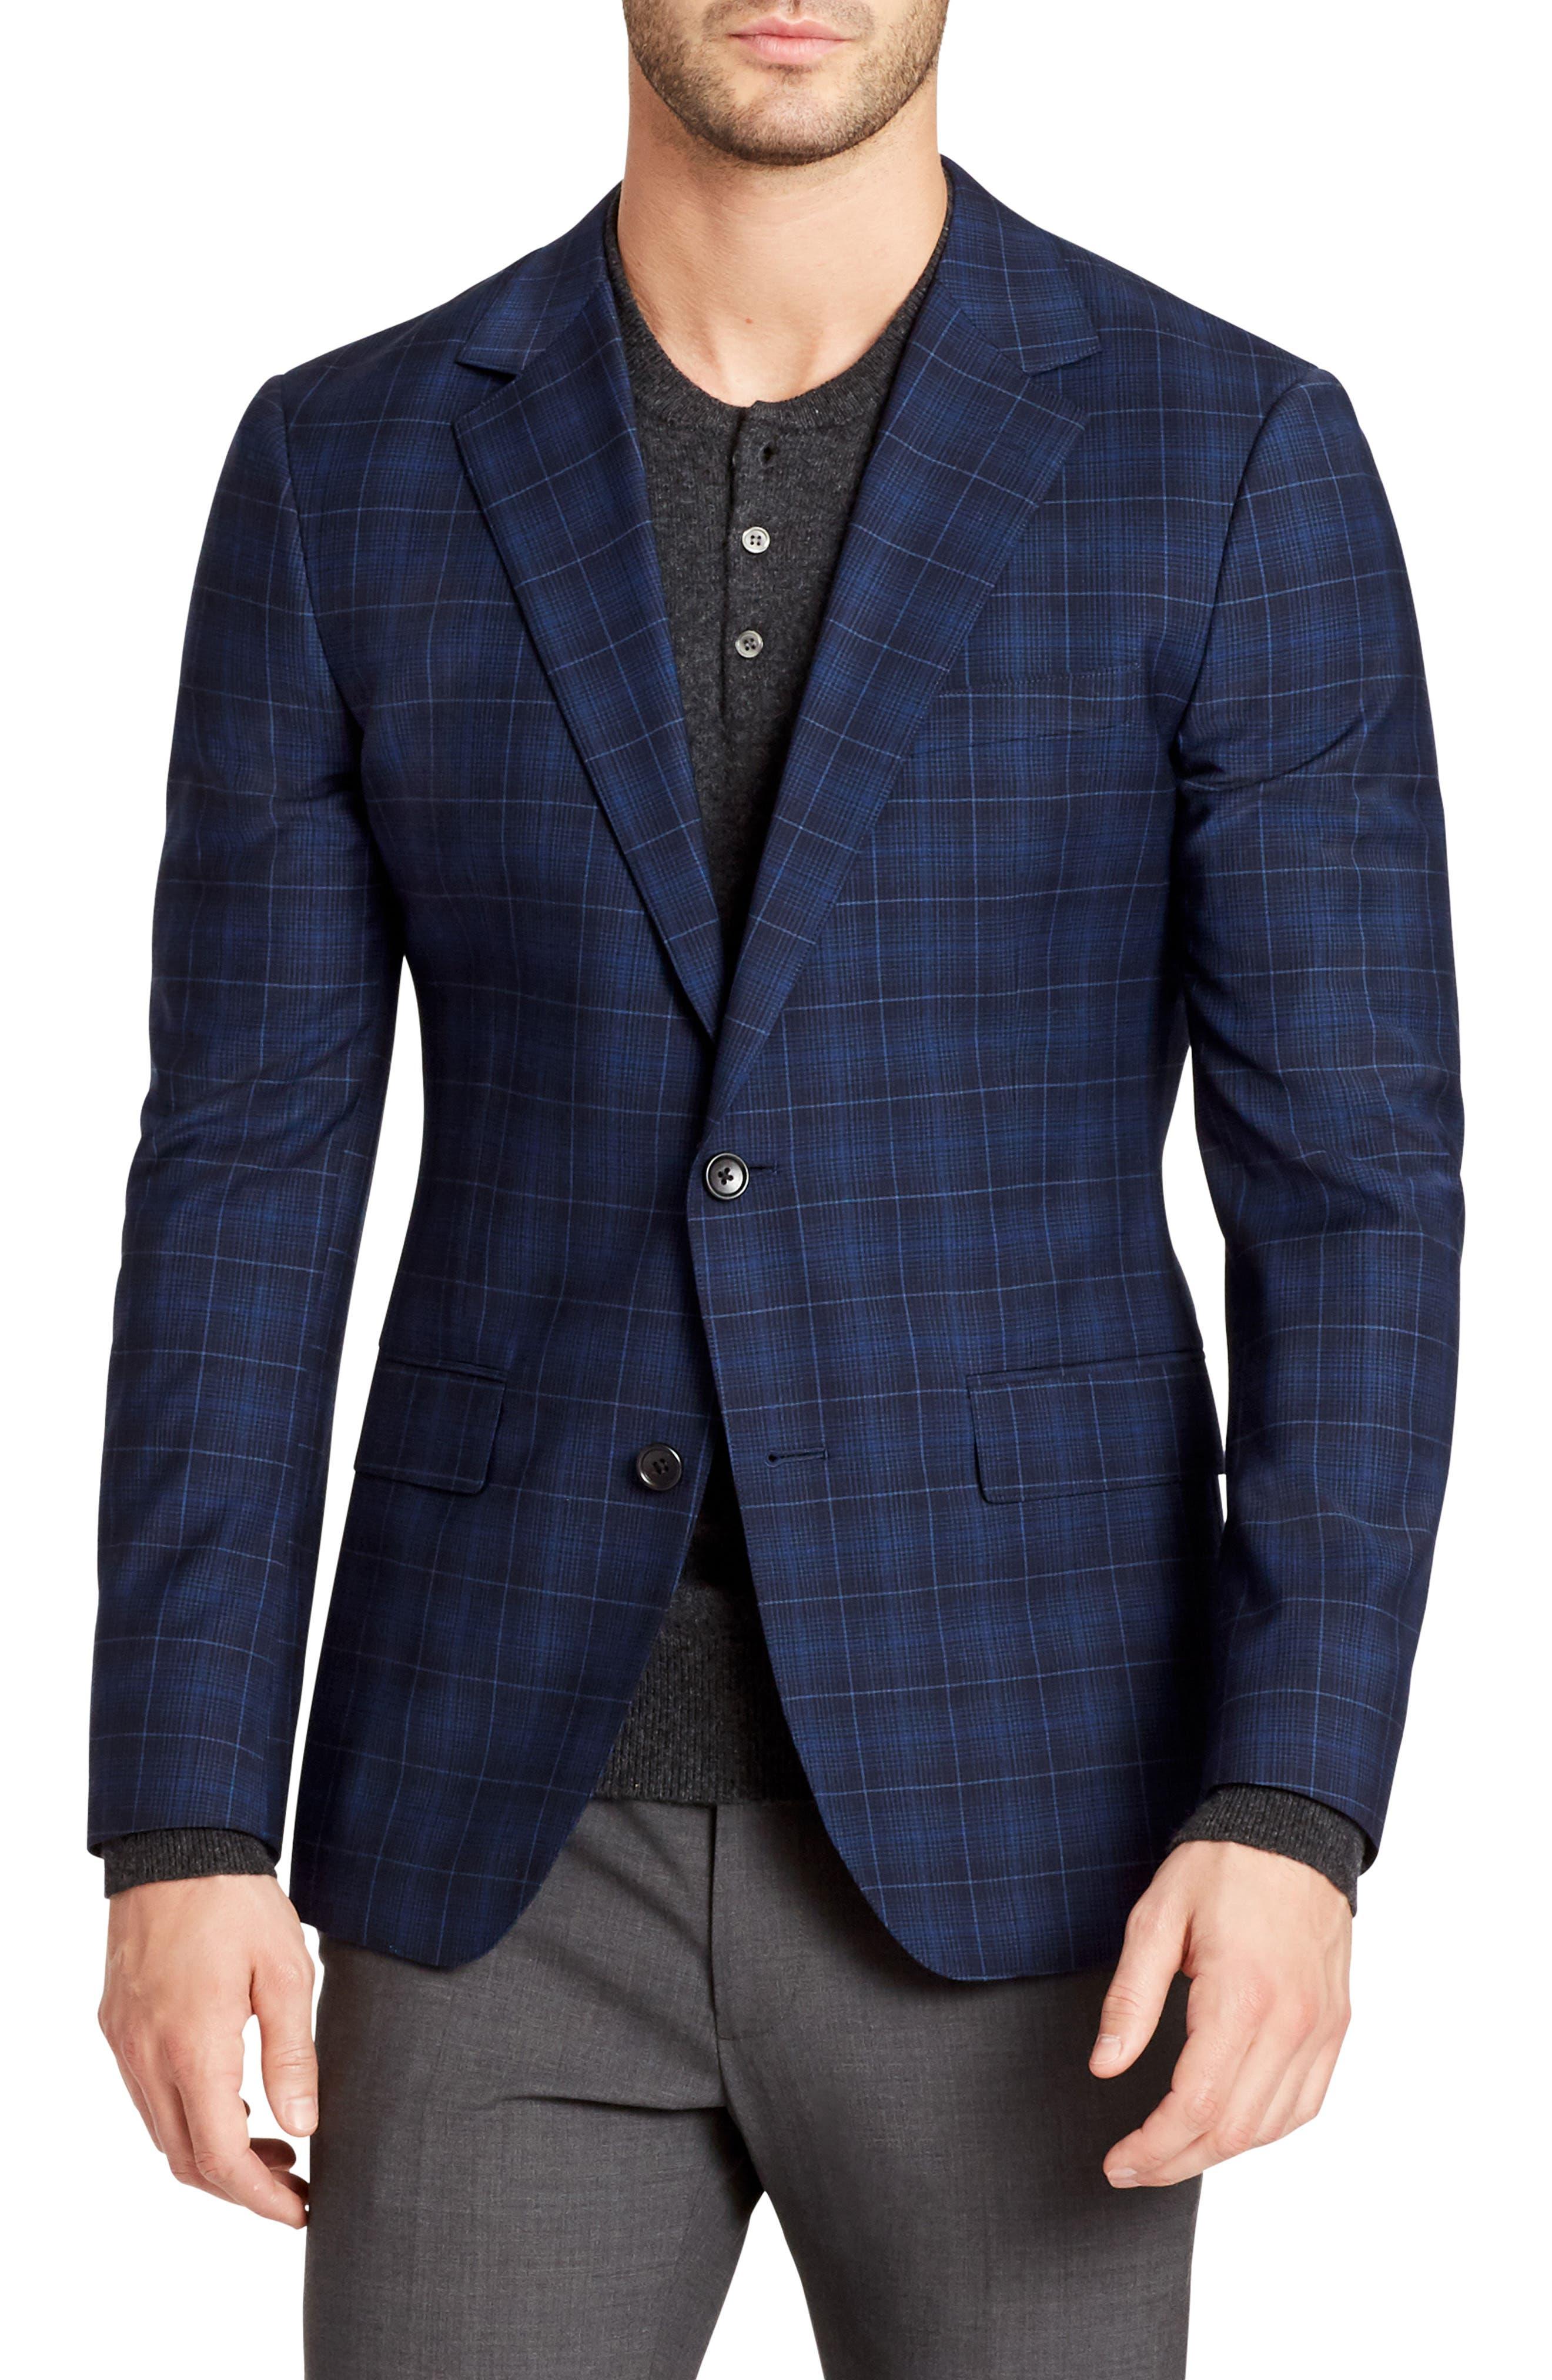 Jetsetter Slim Fit Plaid Wool Sport Coat,                         Main,                         color, 400